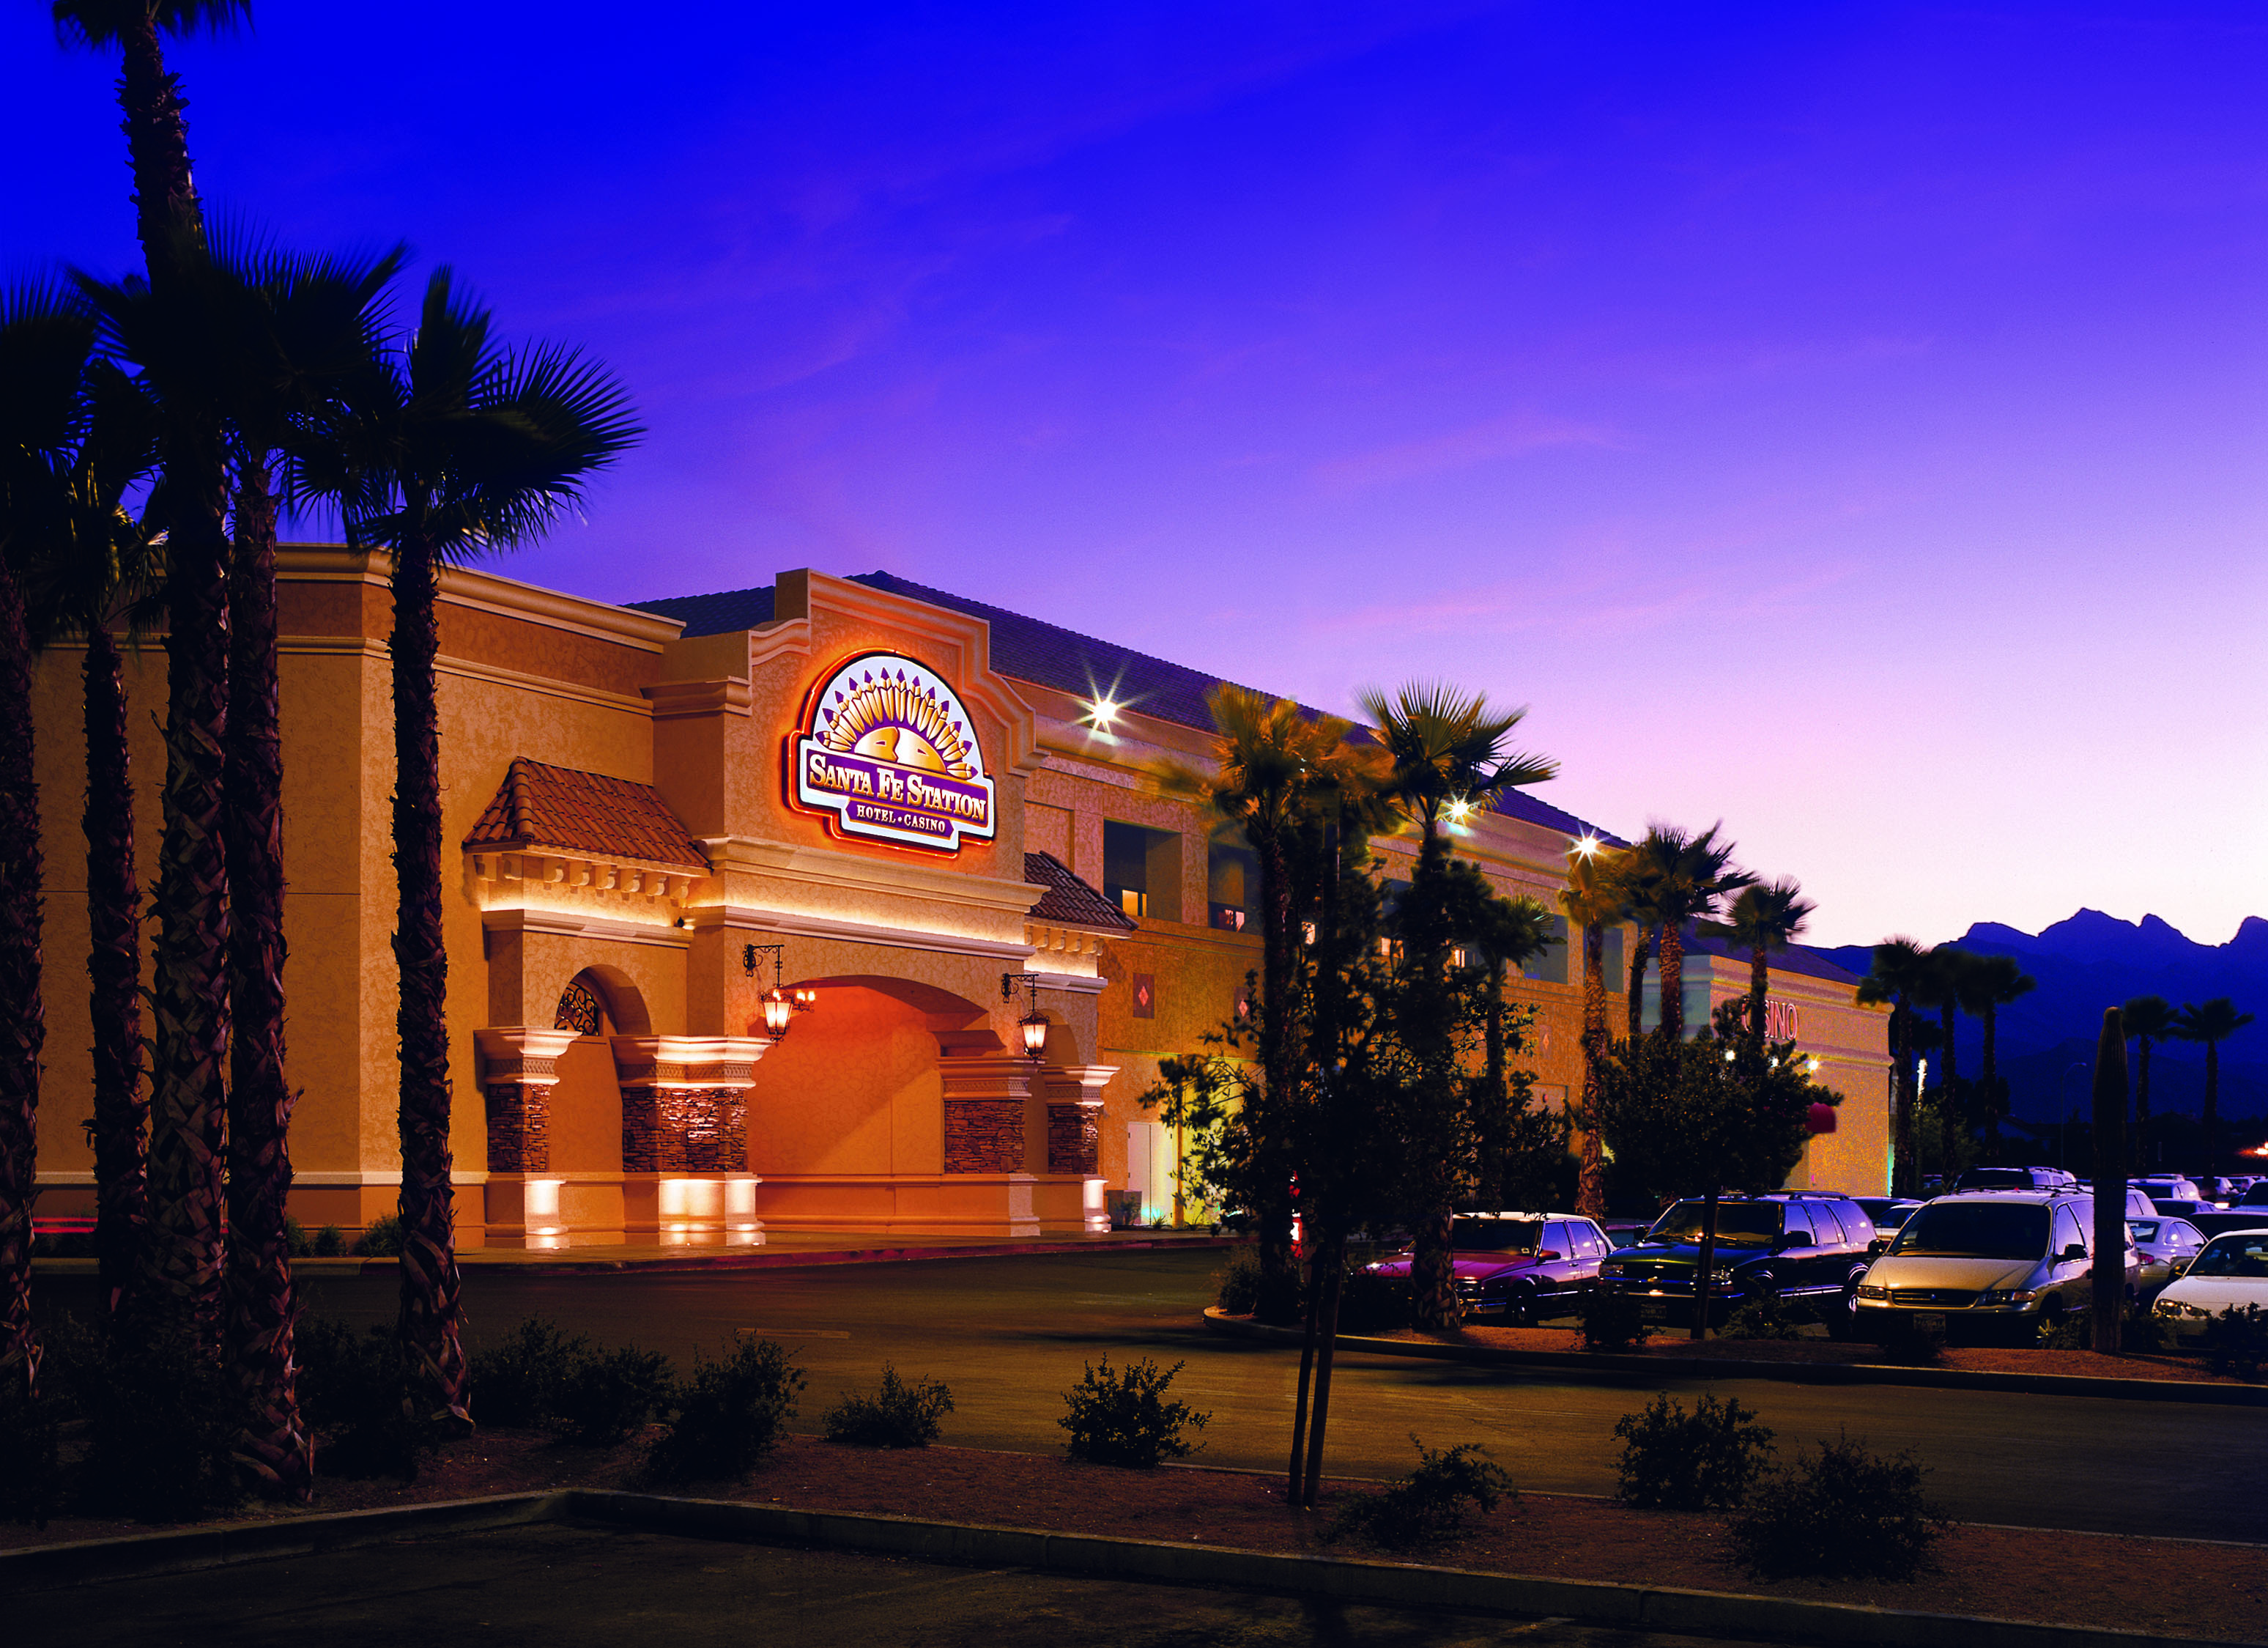 Santa Fe Station Hotel